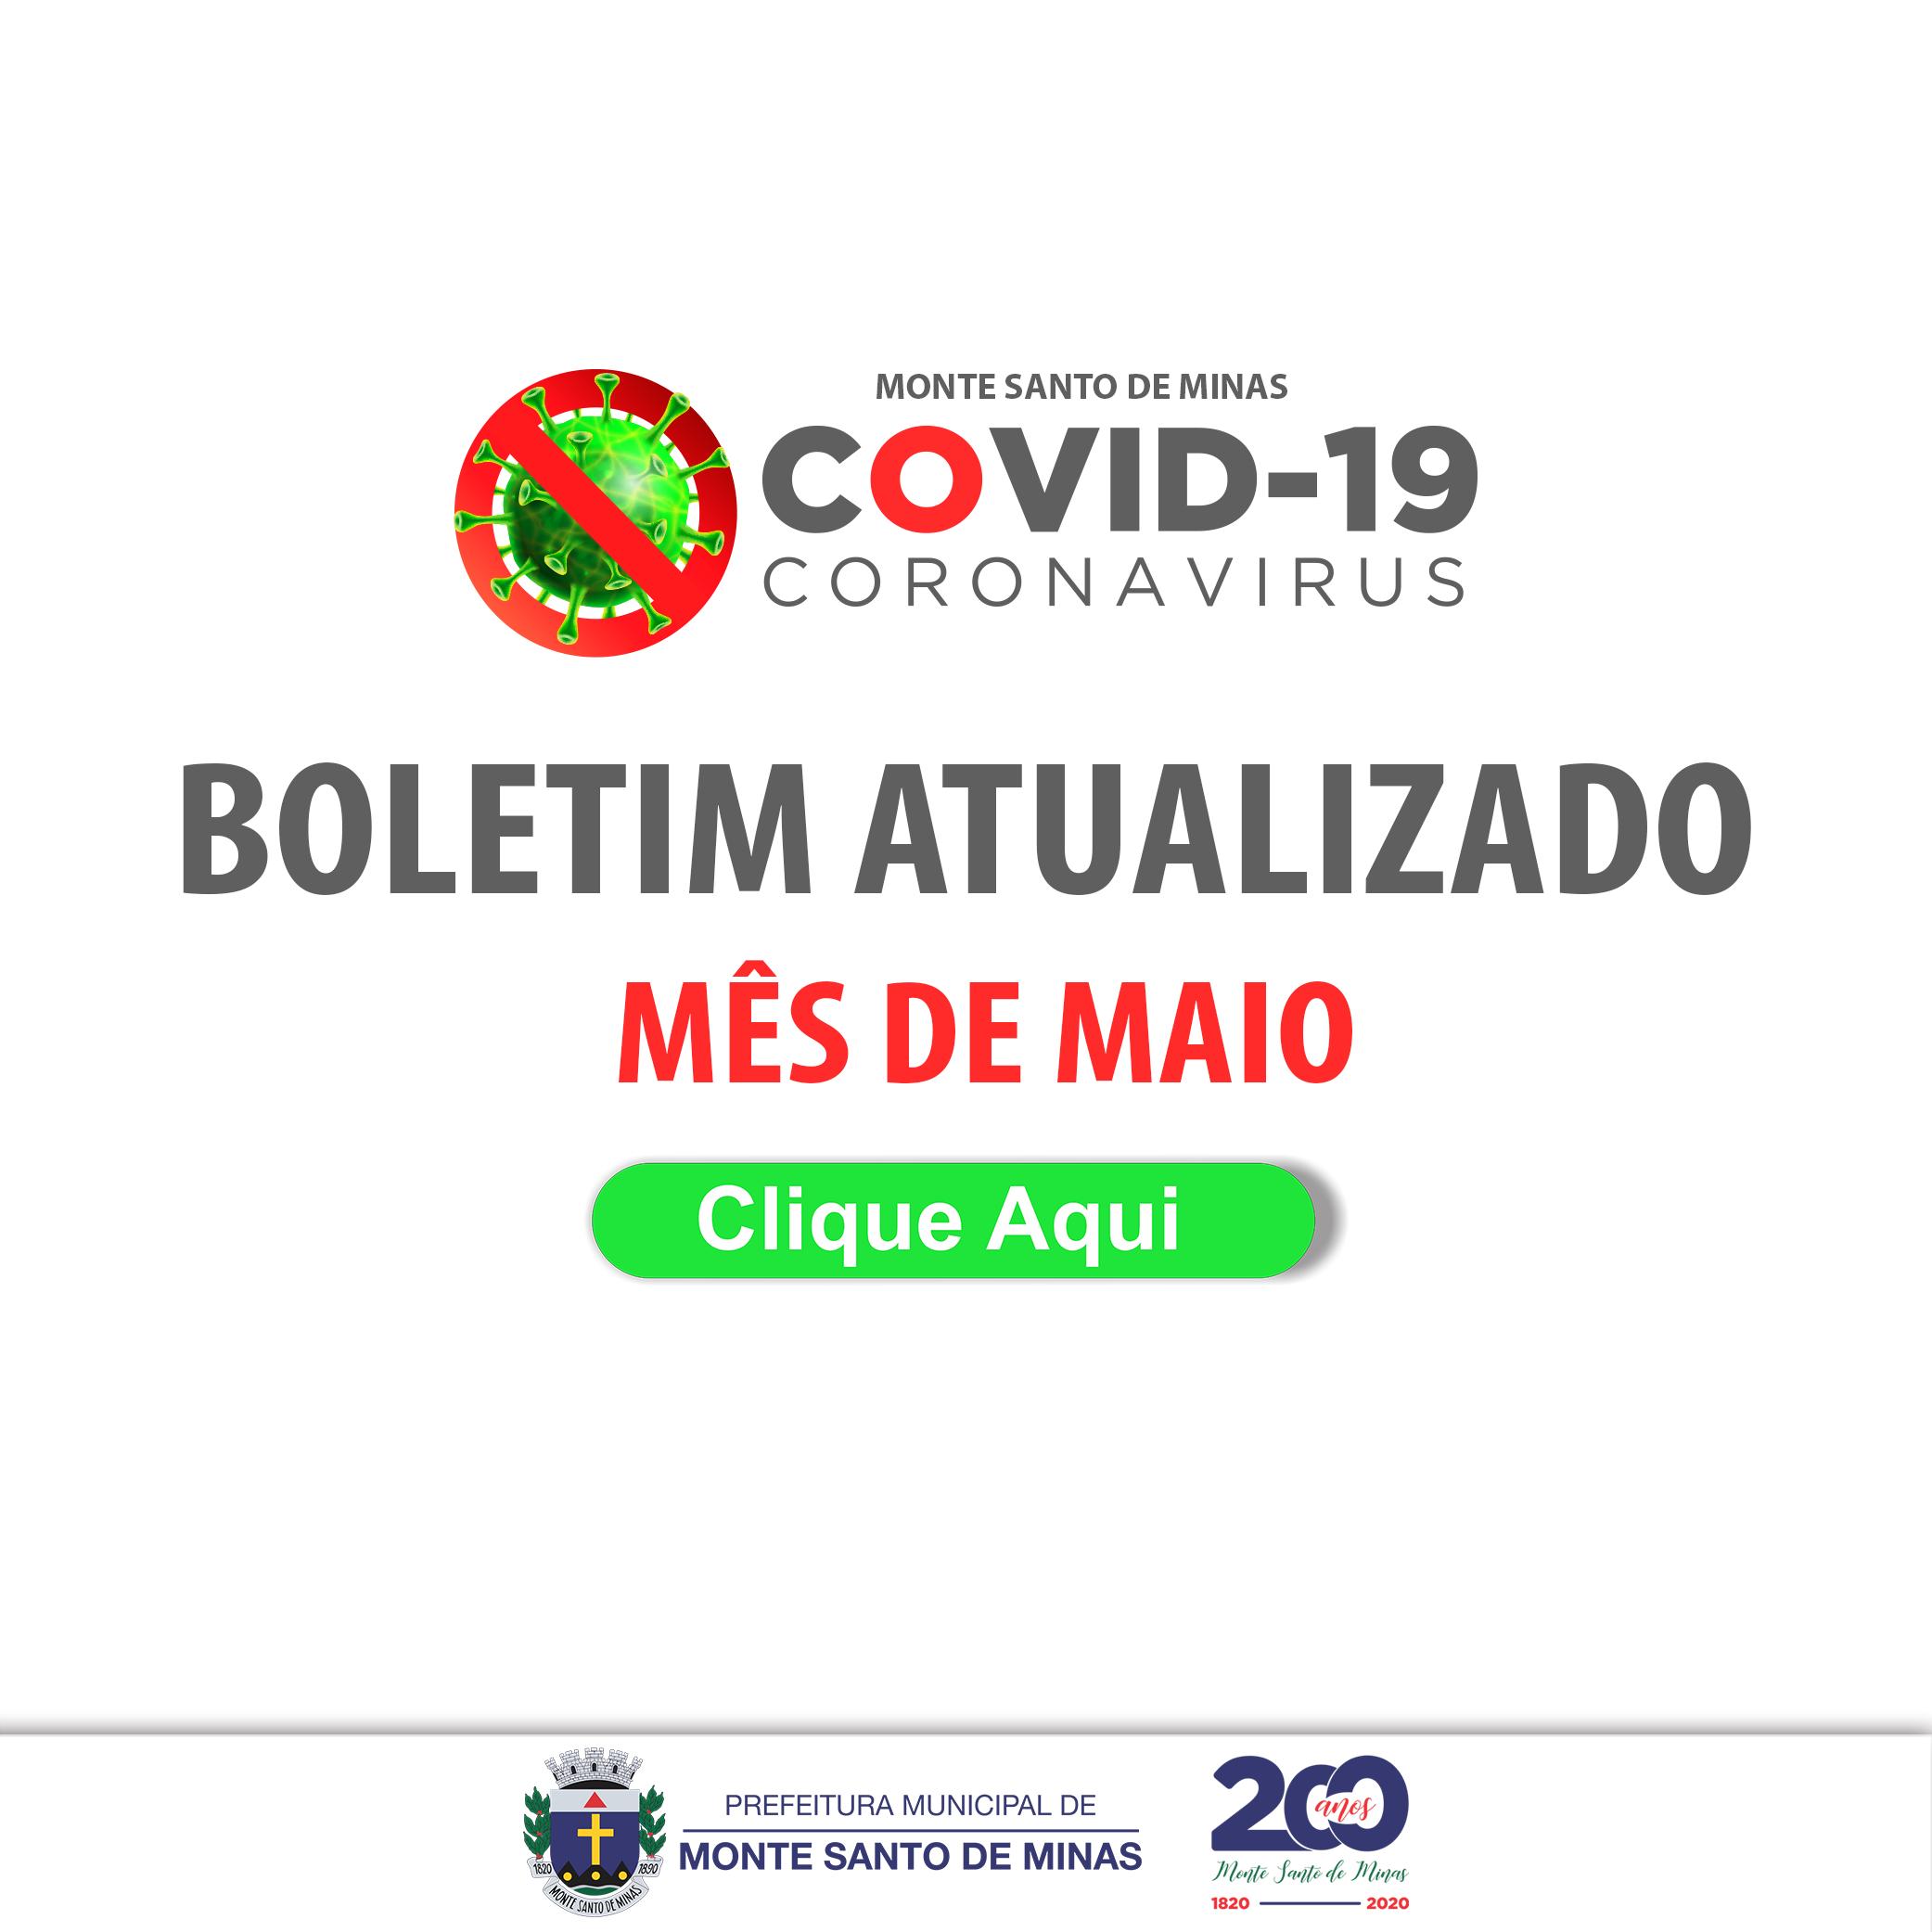 Boletim COVID-19 por mês – 2020